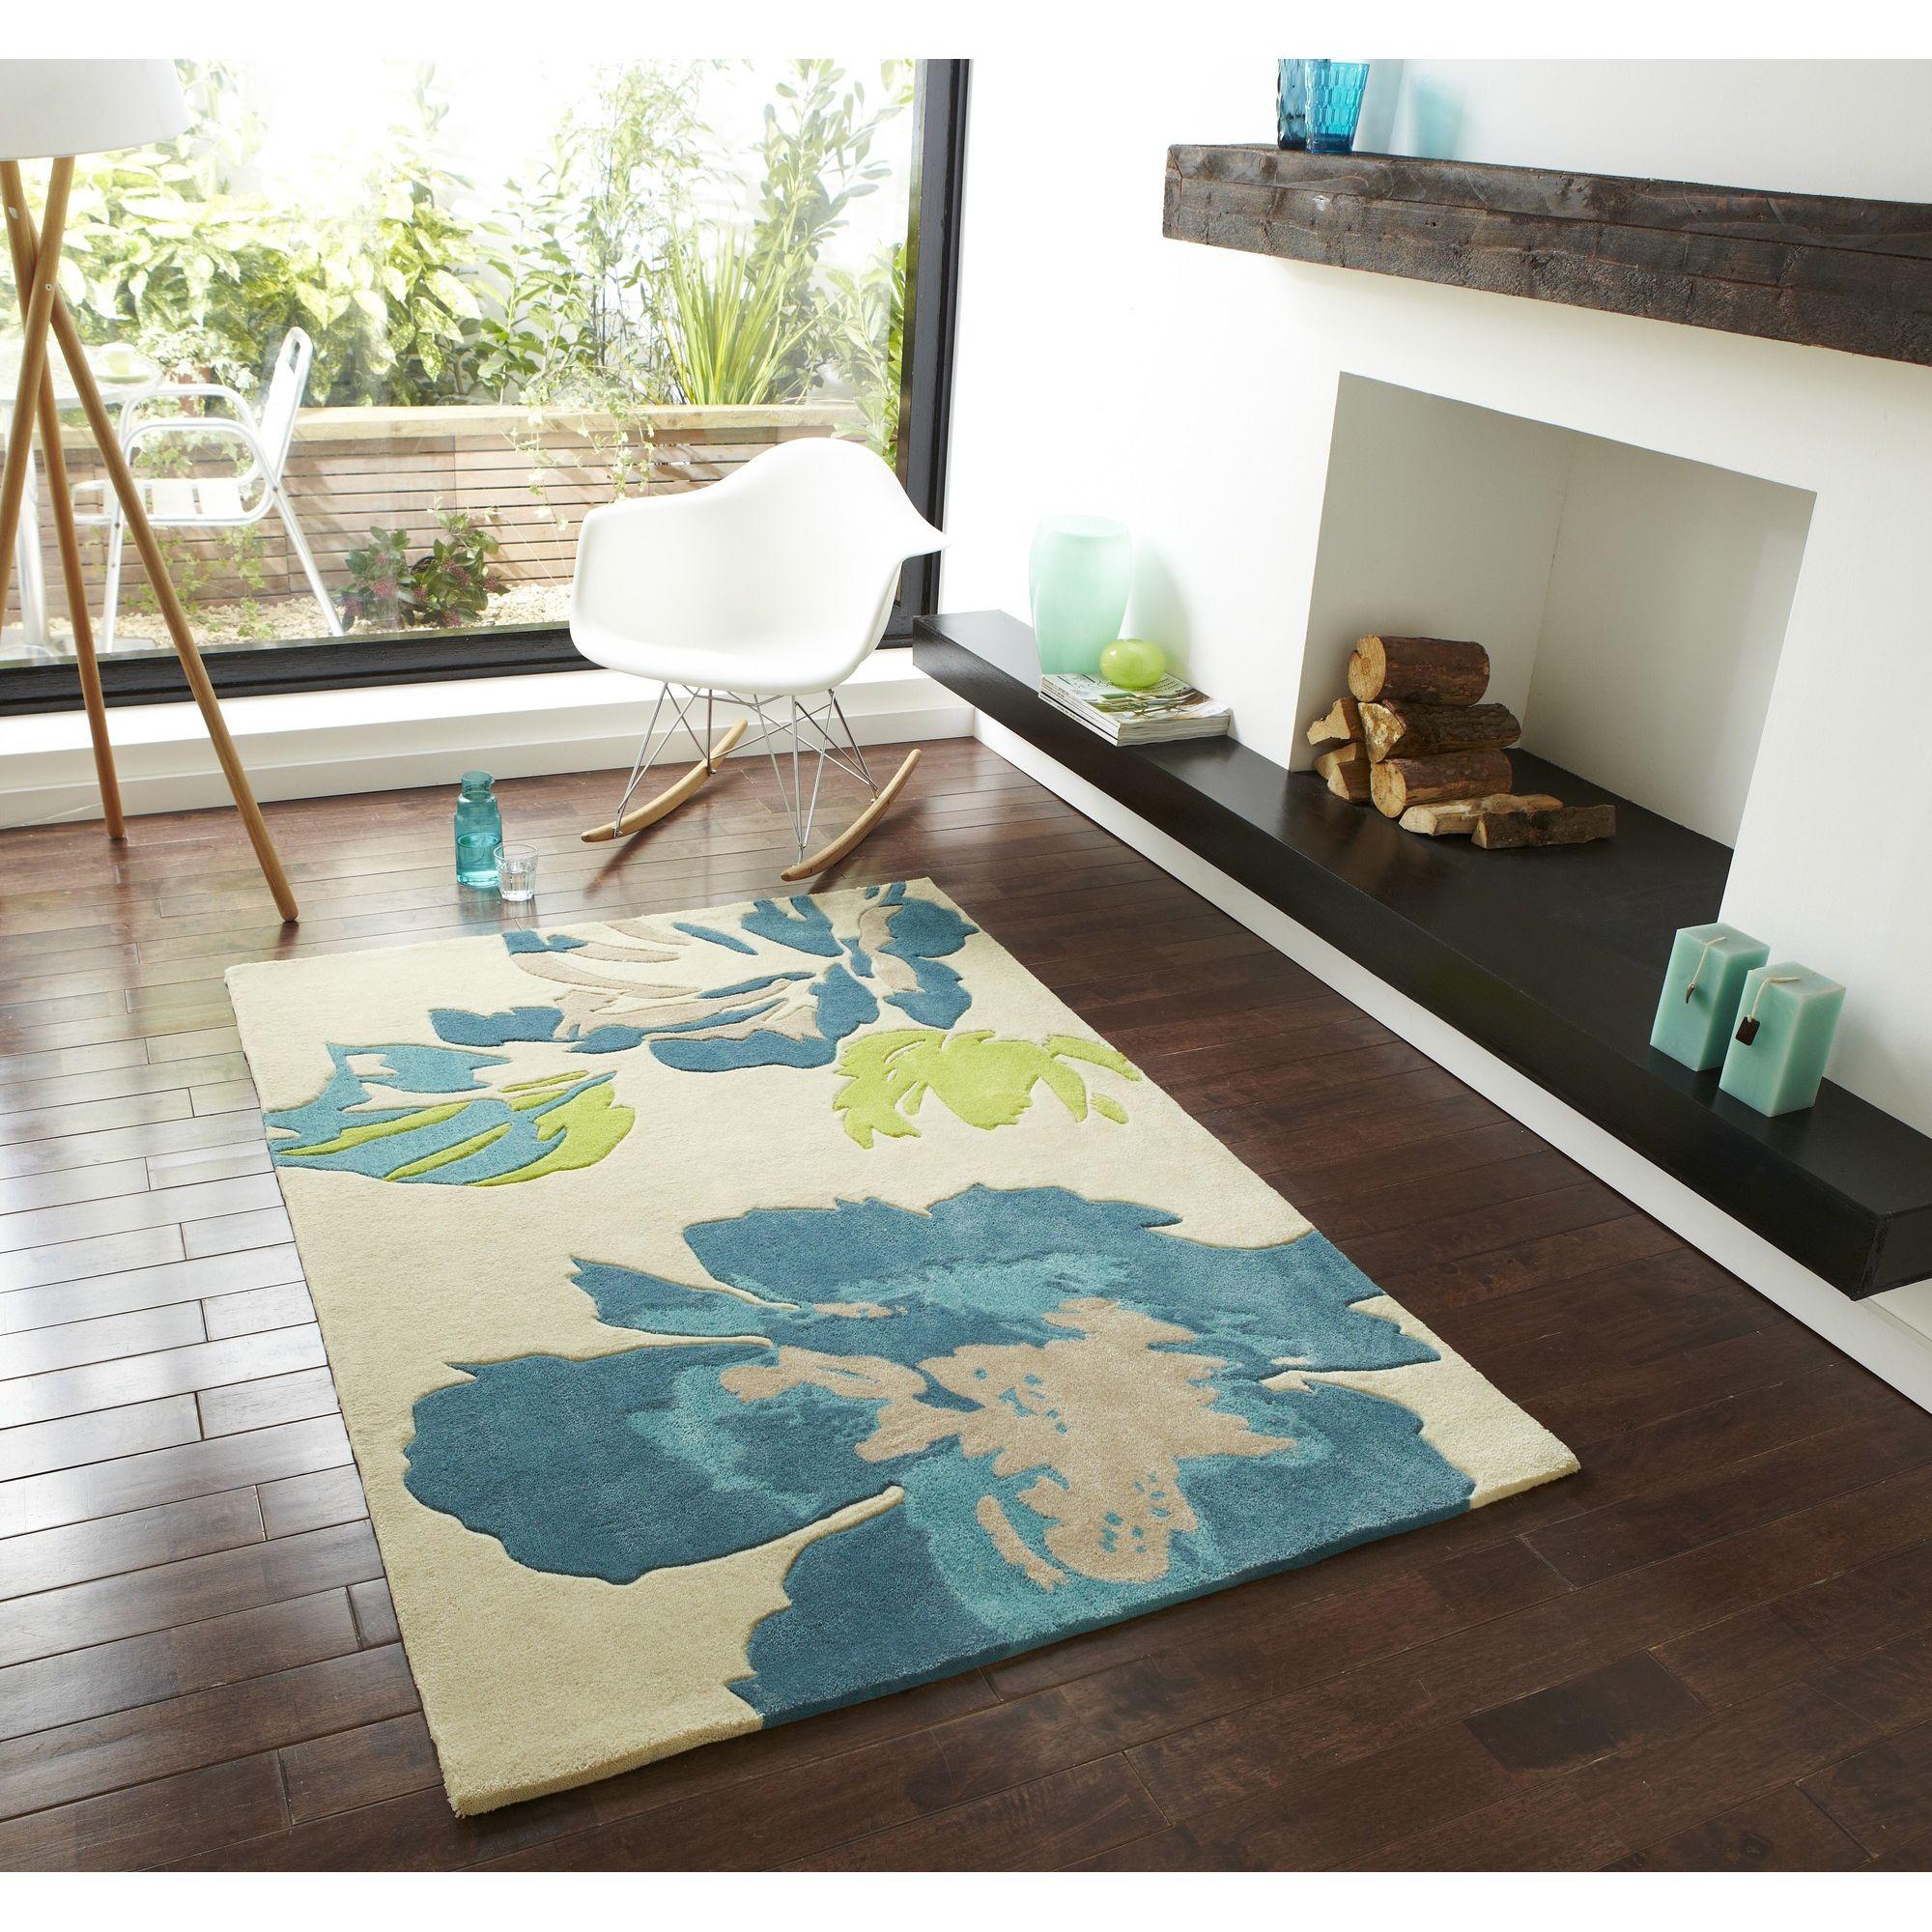 Oriental Carpets & Rugs Hong Kong 2827 Beige/Blue Rug - 90cm x 150cm